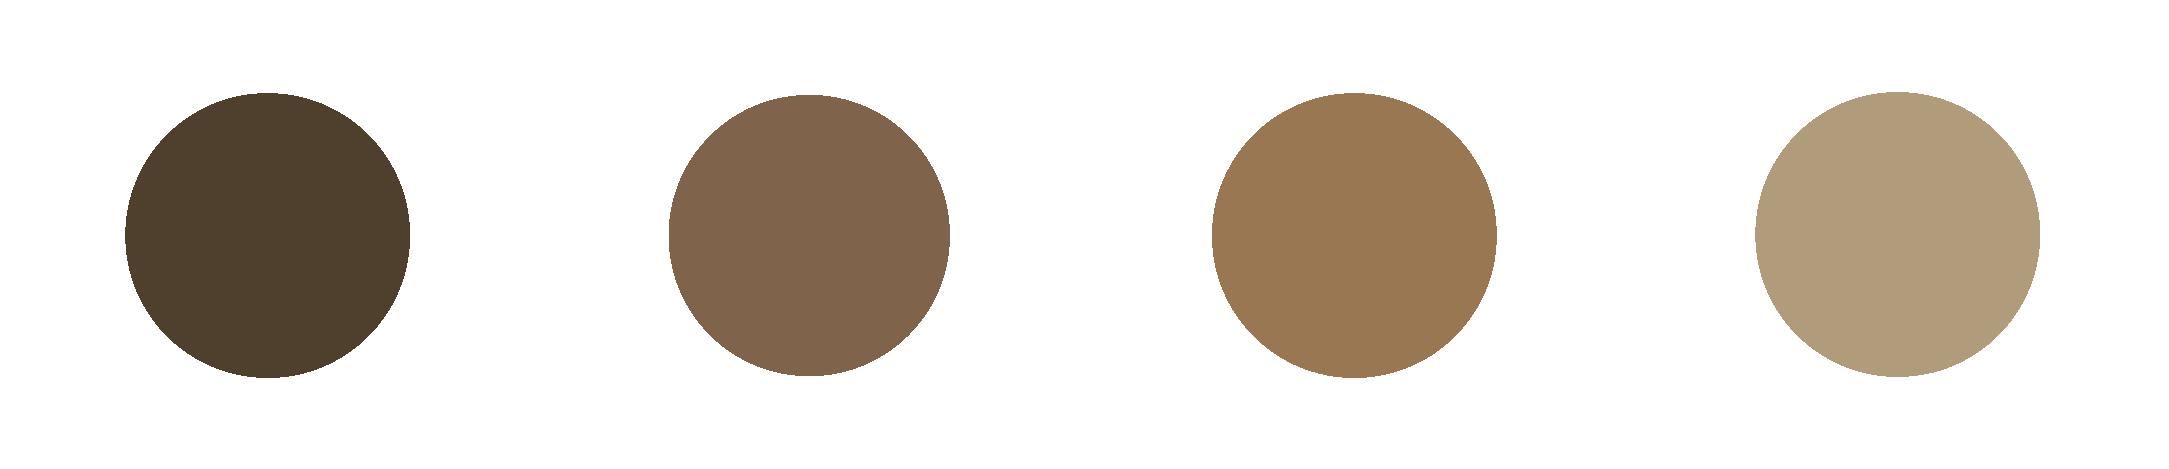 Brown-02.png